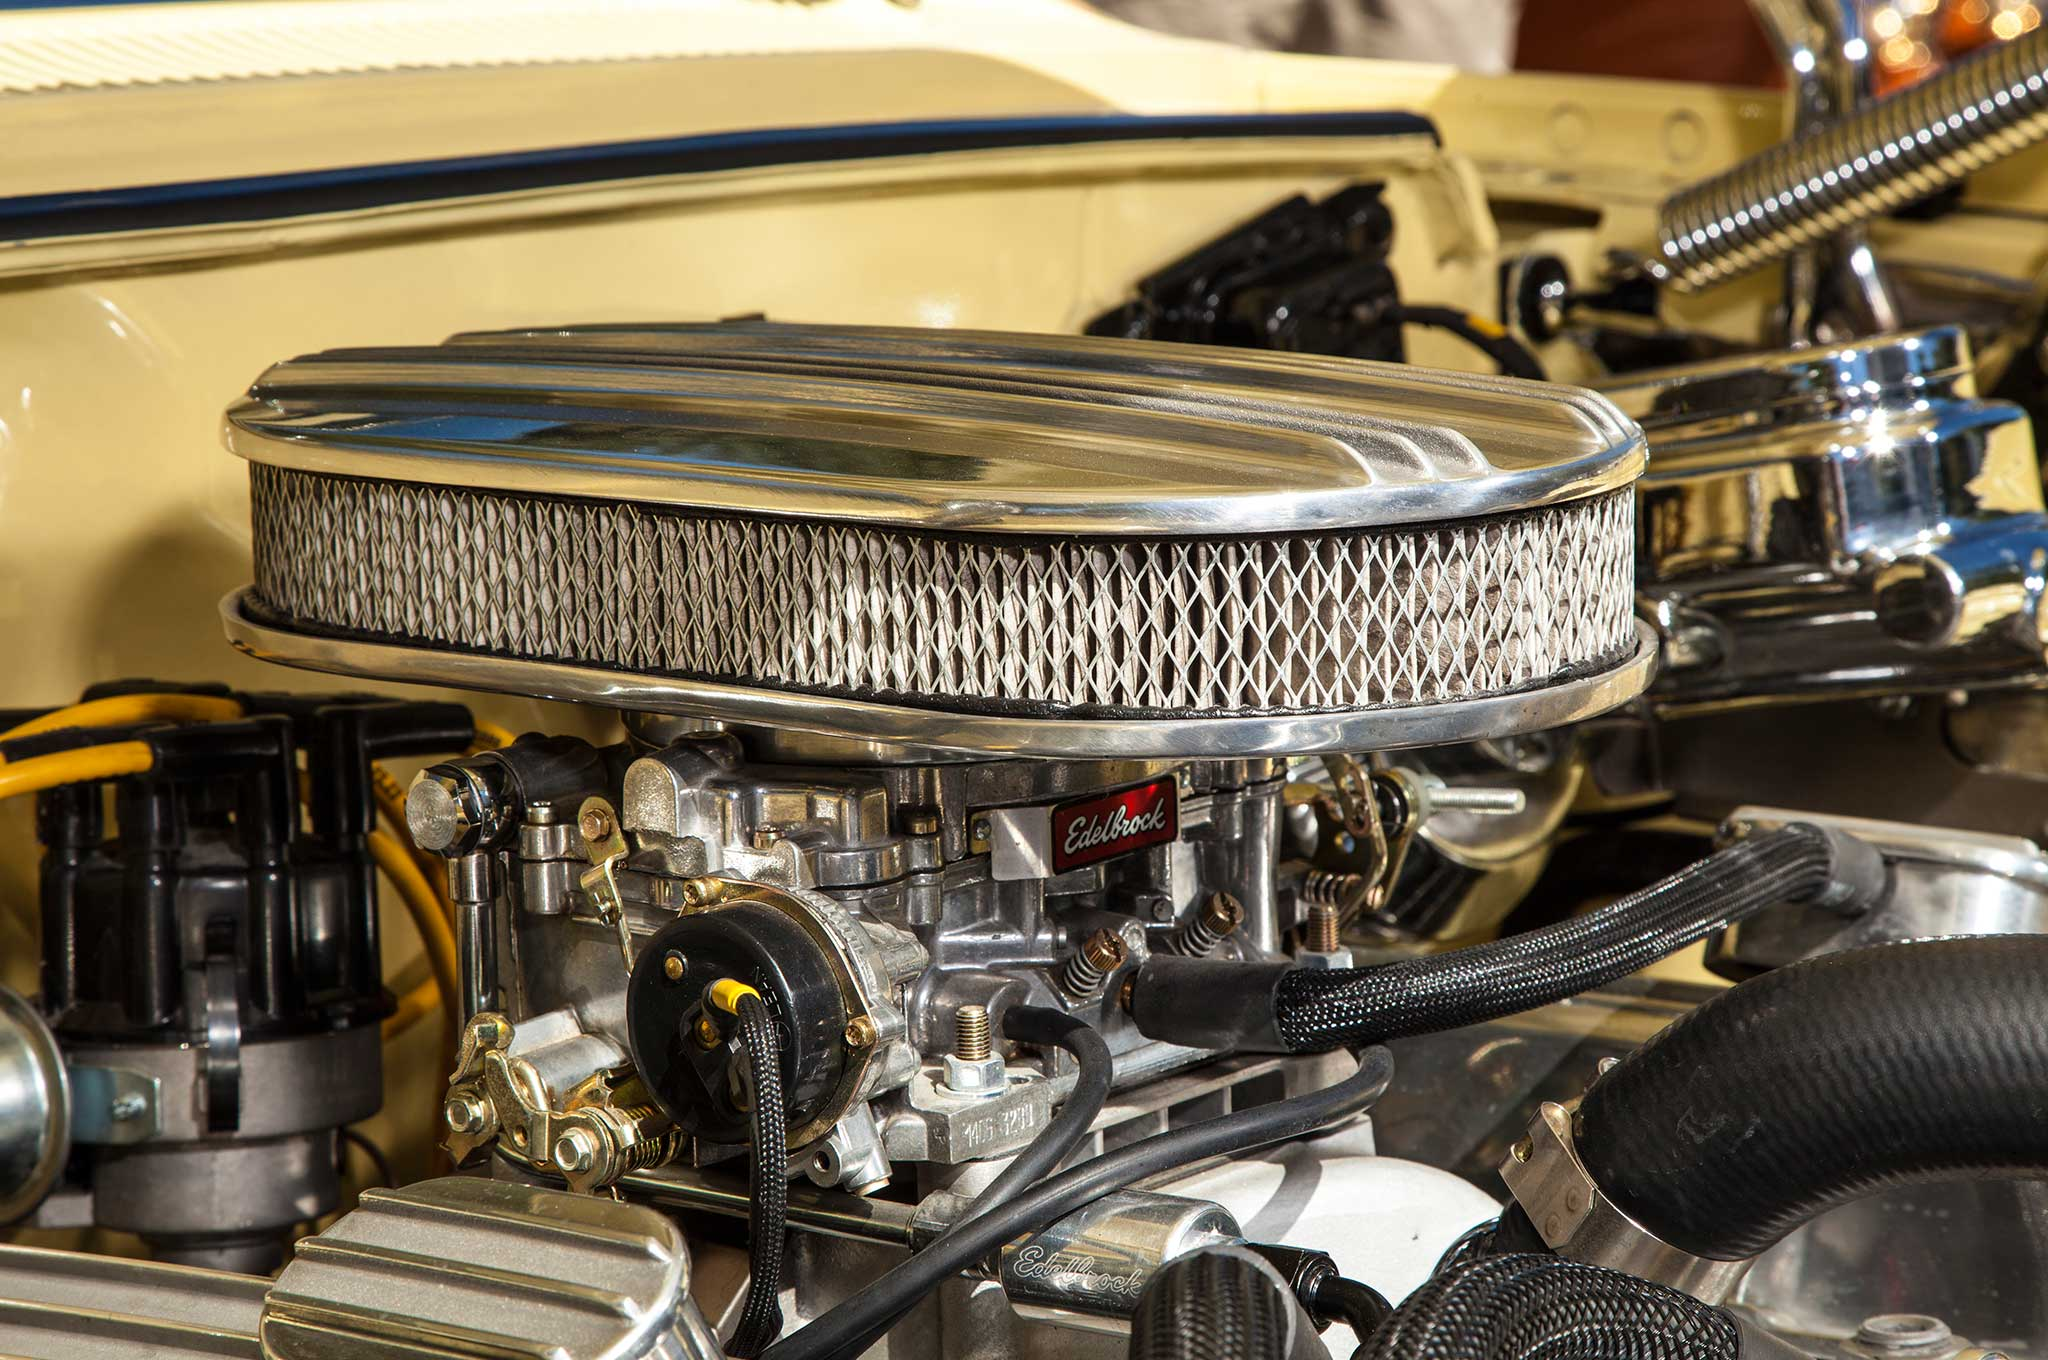 1964 Chevrolet Impala - Sun Break - Lowrider